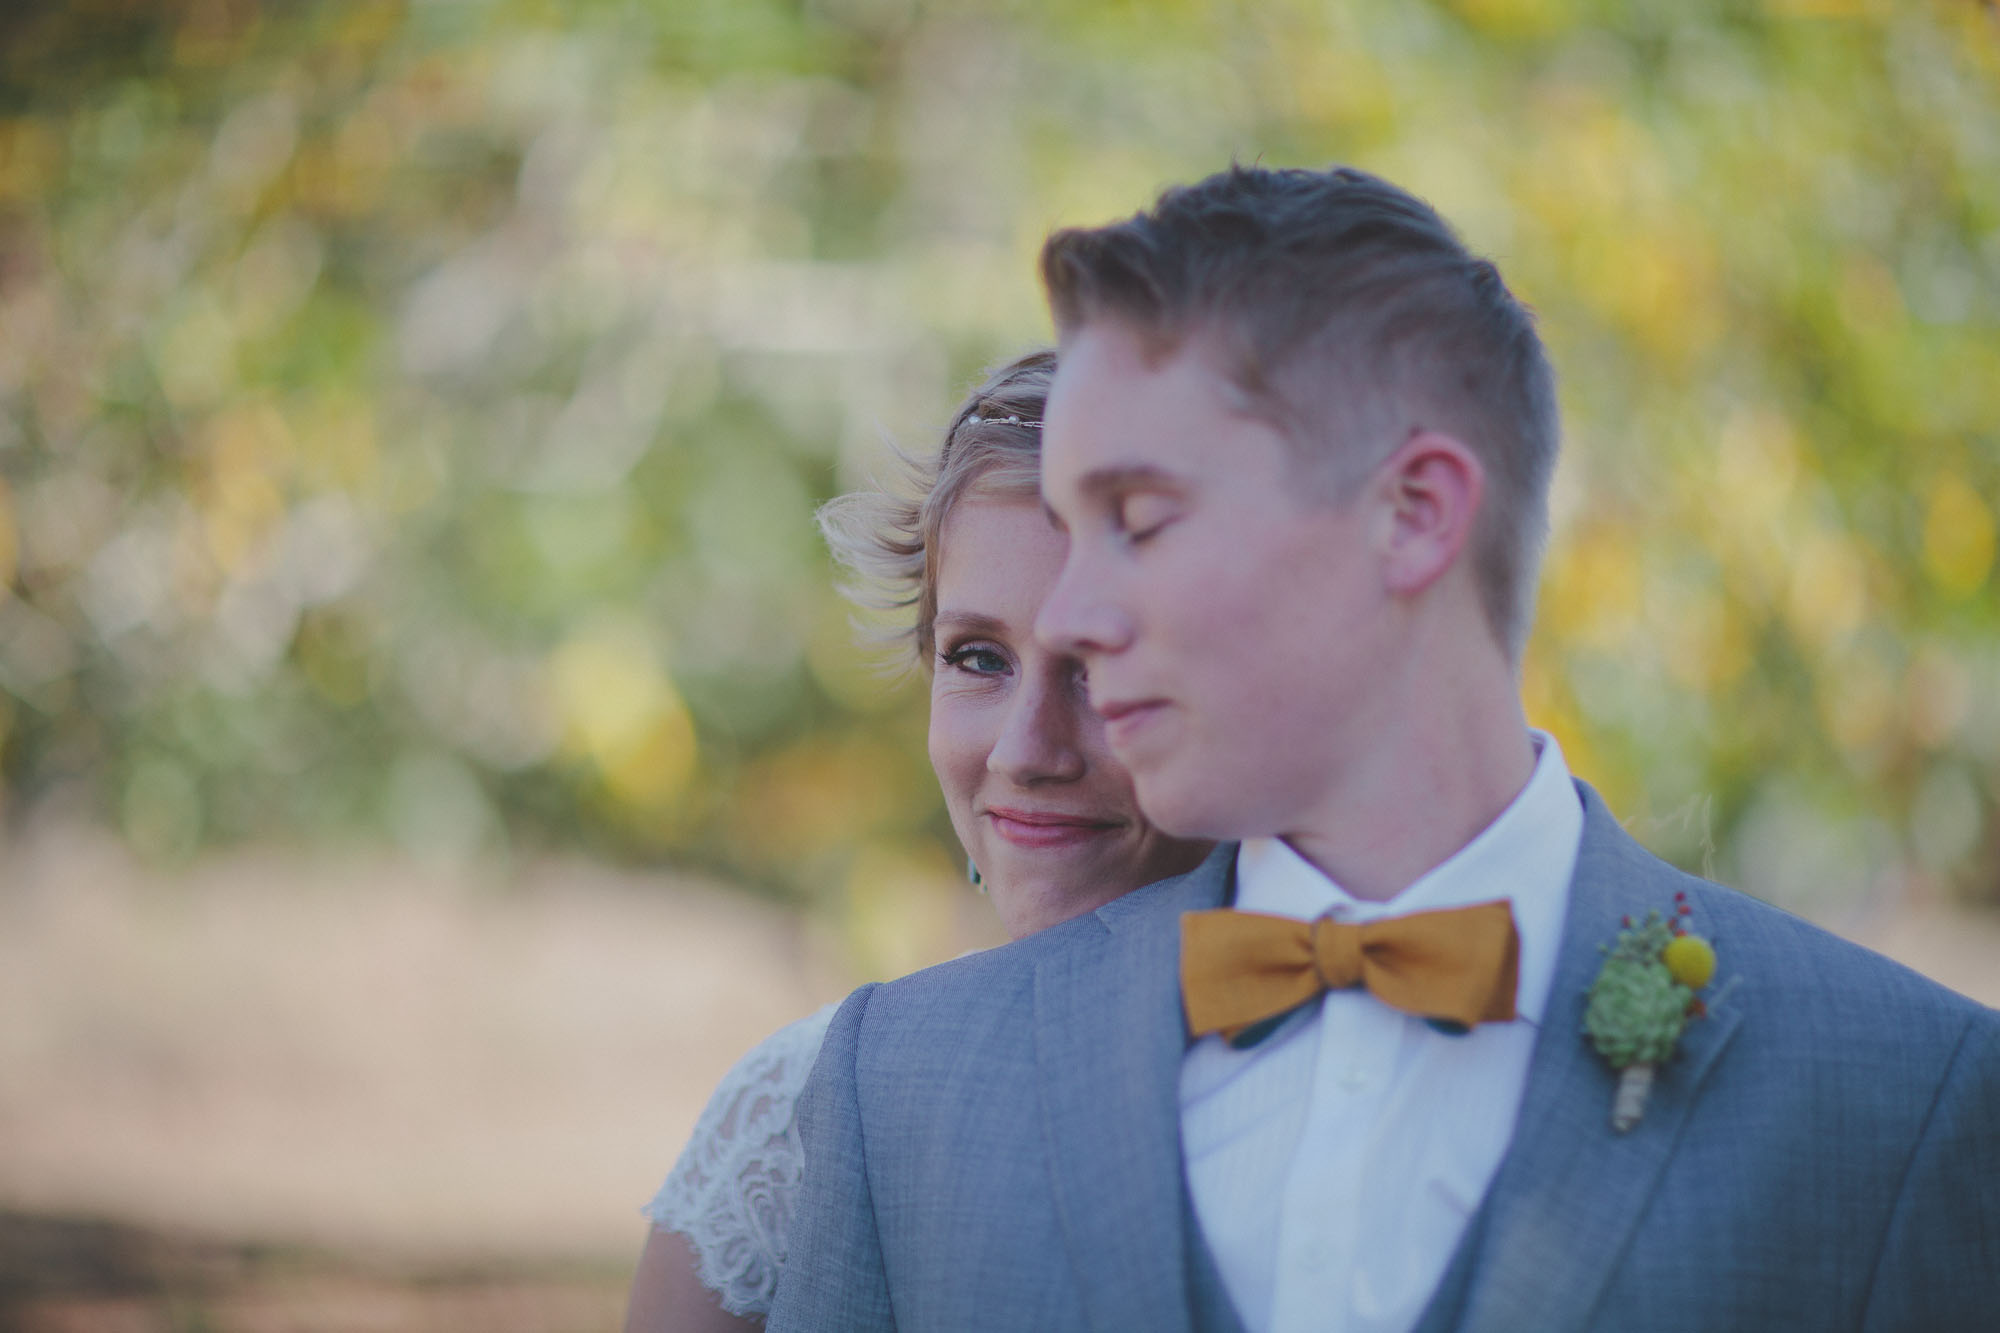 Gretchen_Gause_Petaluma_Olympias_Valley_Wedding_Photo-107.jpg